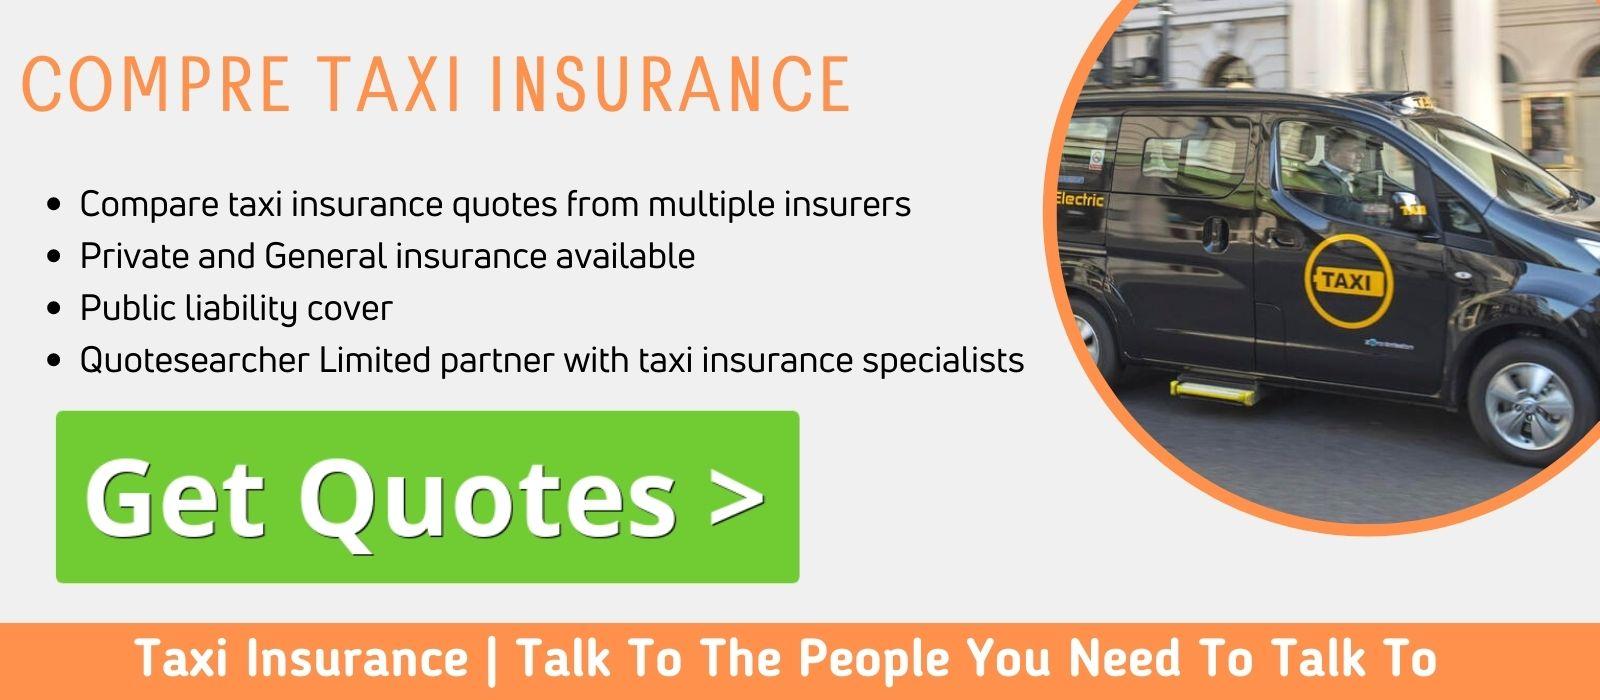 Compare Taxi Insurance Prices